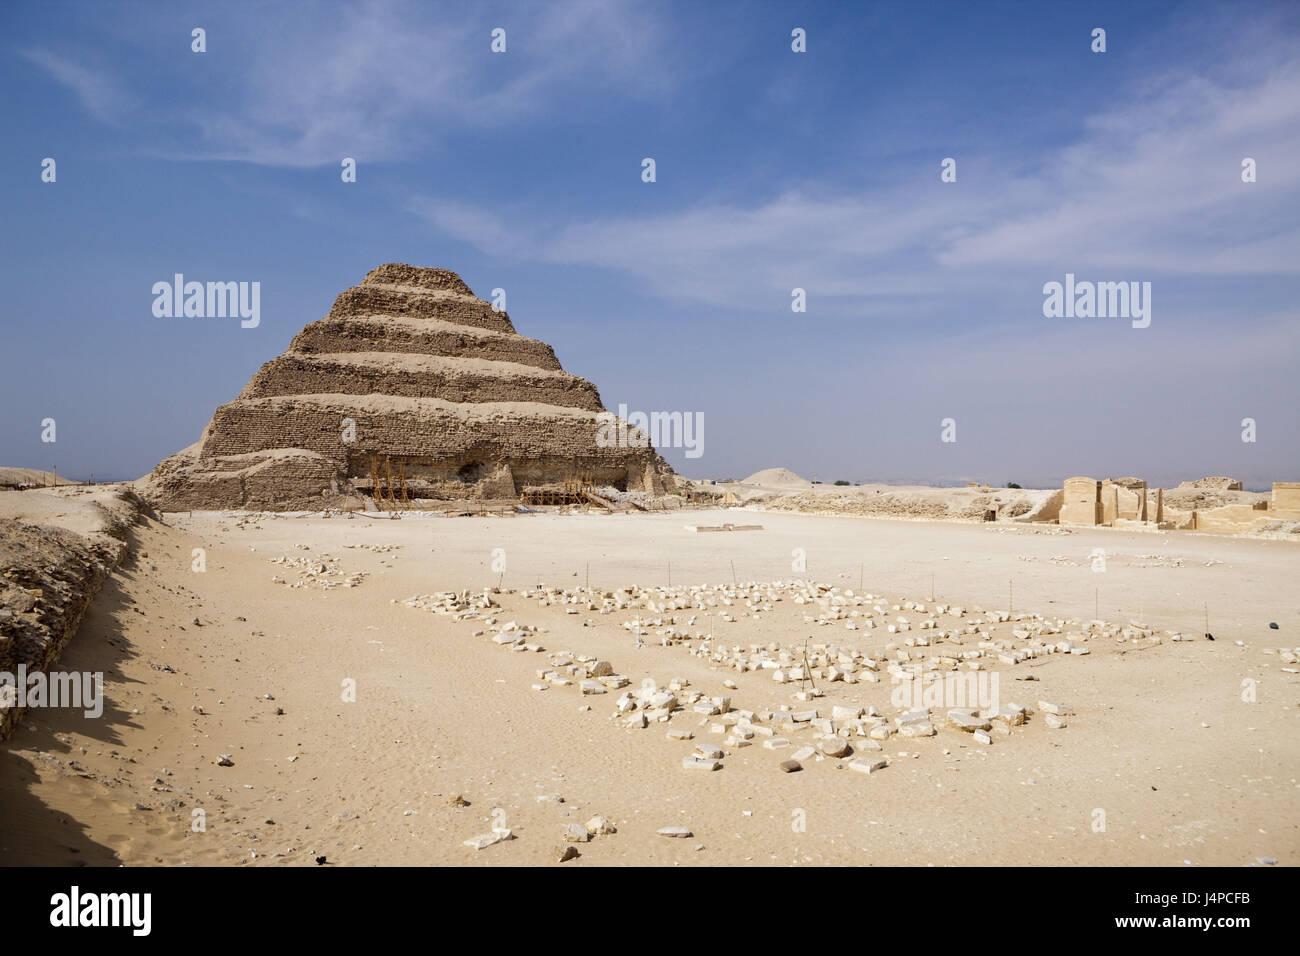 Pyramide de Sakkara le pharaon Djoser, Egypte, Sakkara, Photo Stock